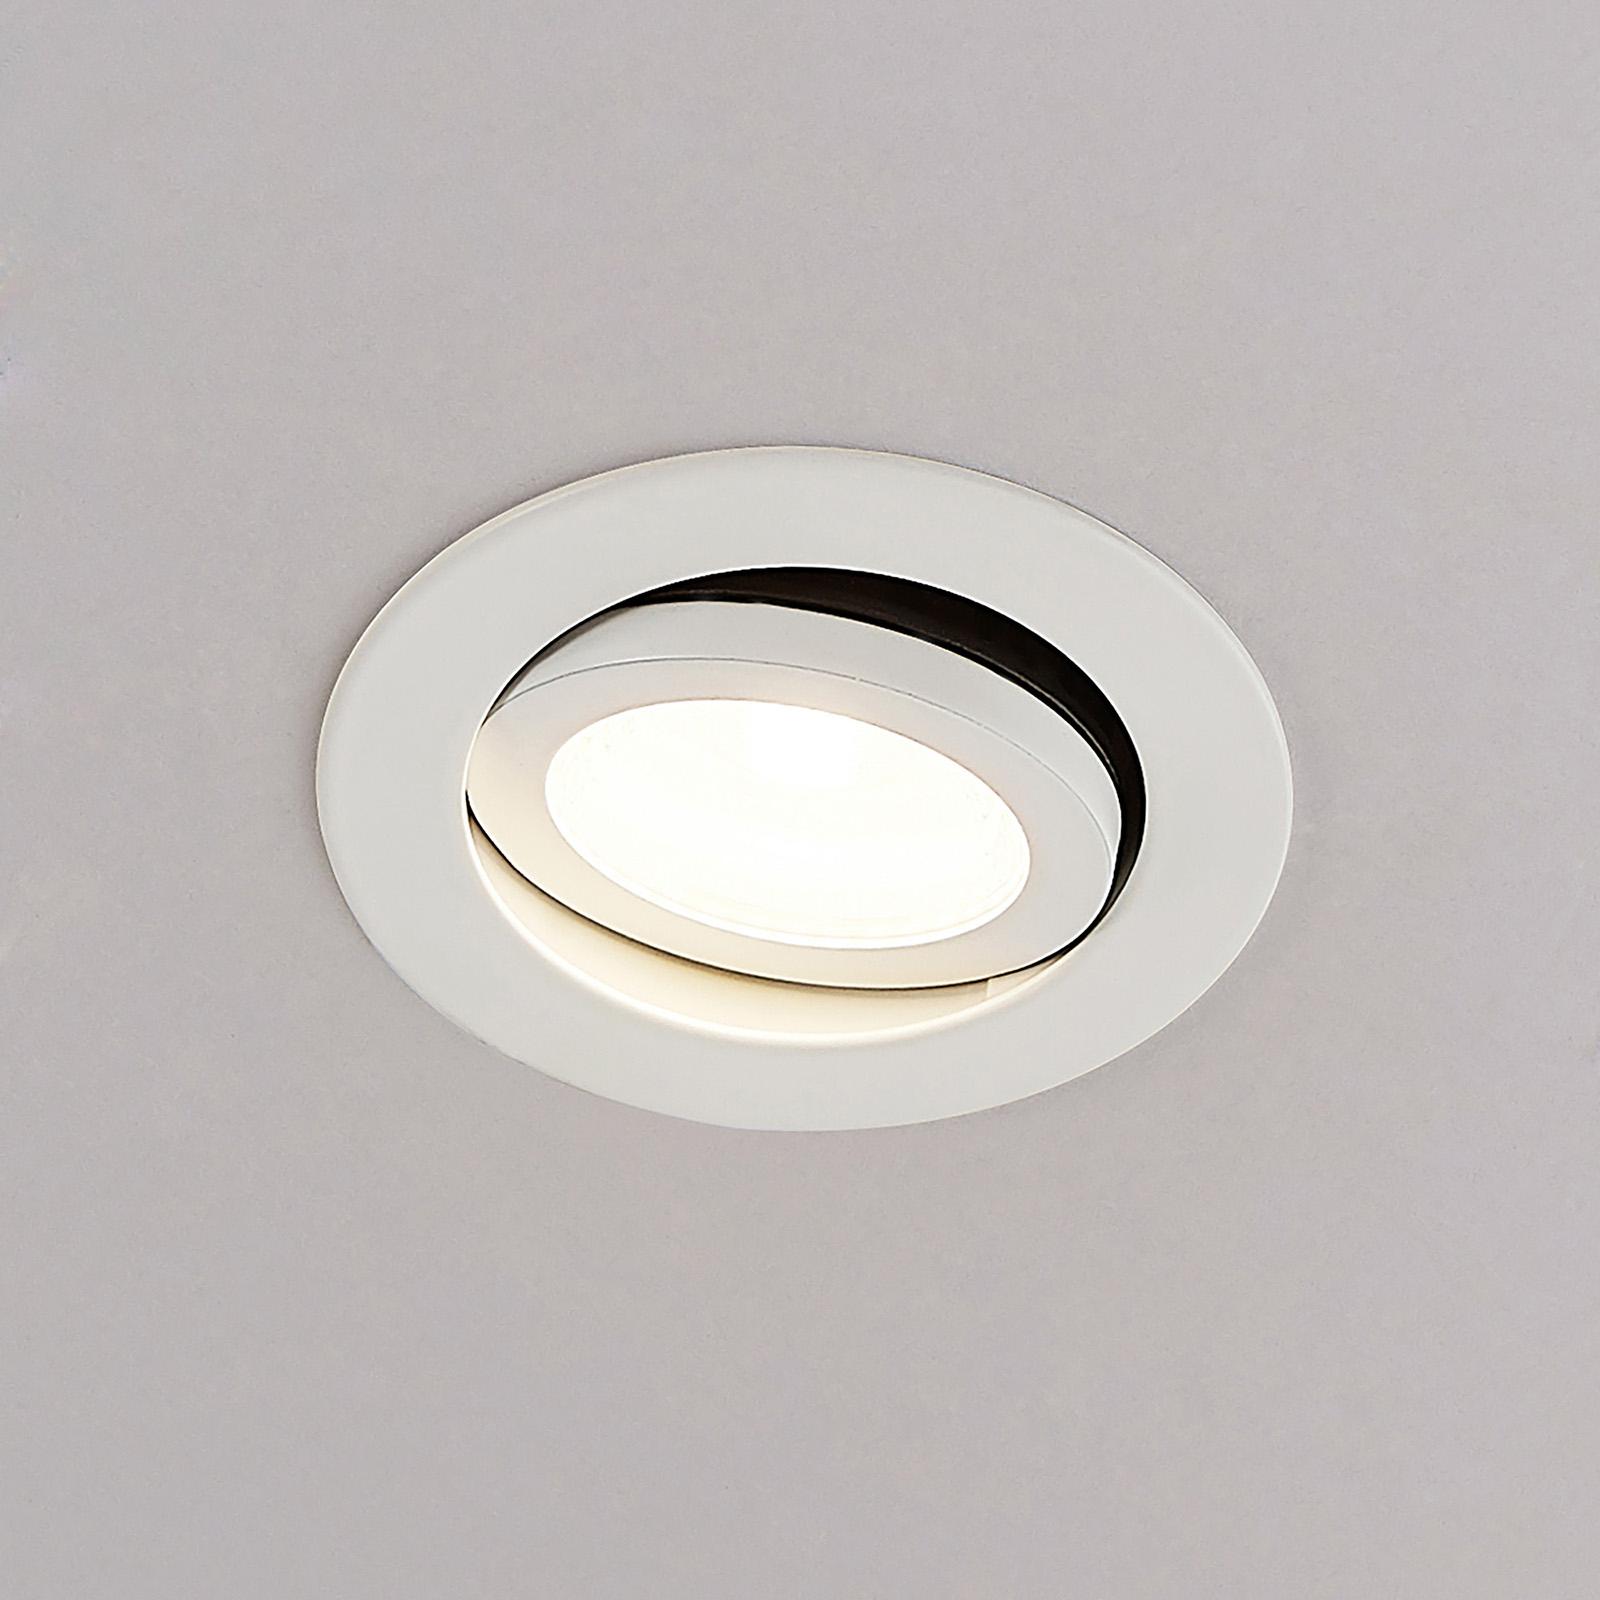 Arcchio Nabor LED-Downlight 36° 2.700K IP65, 4W